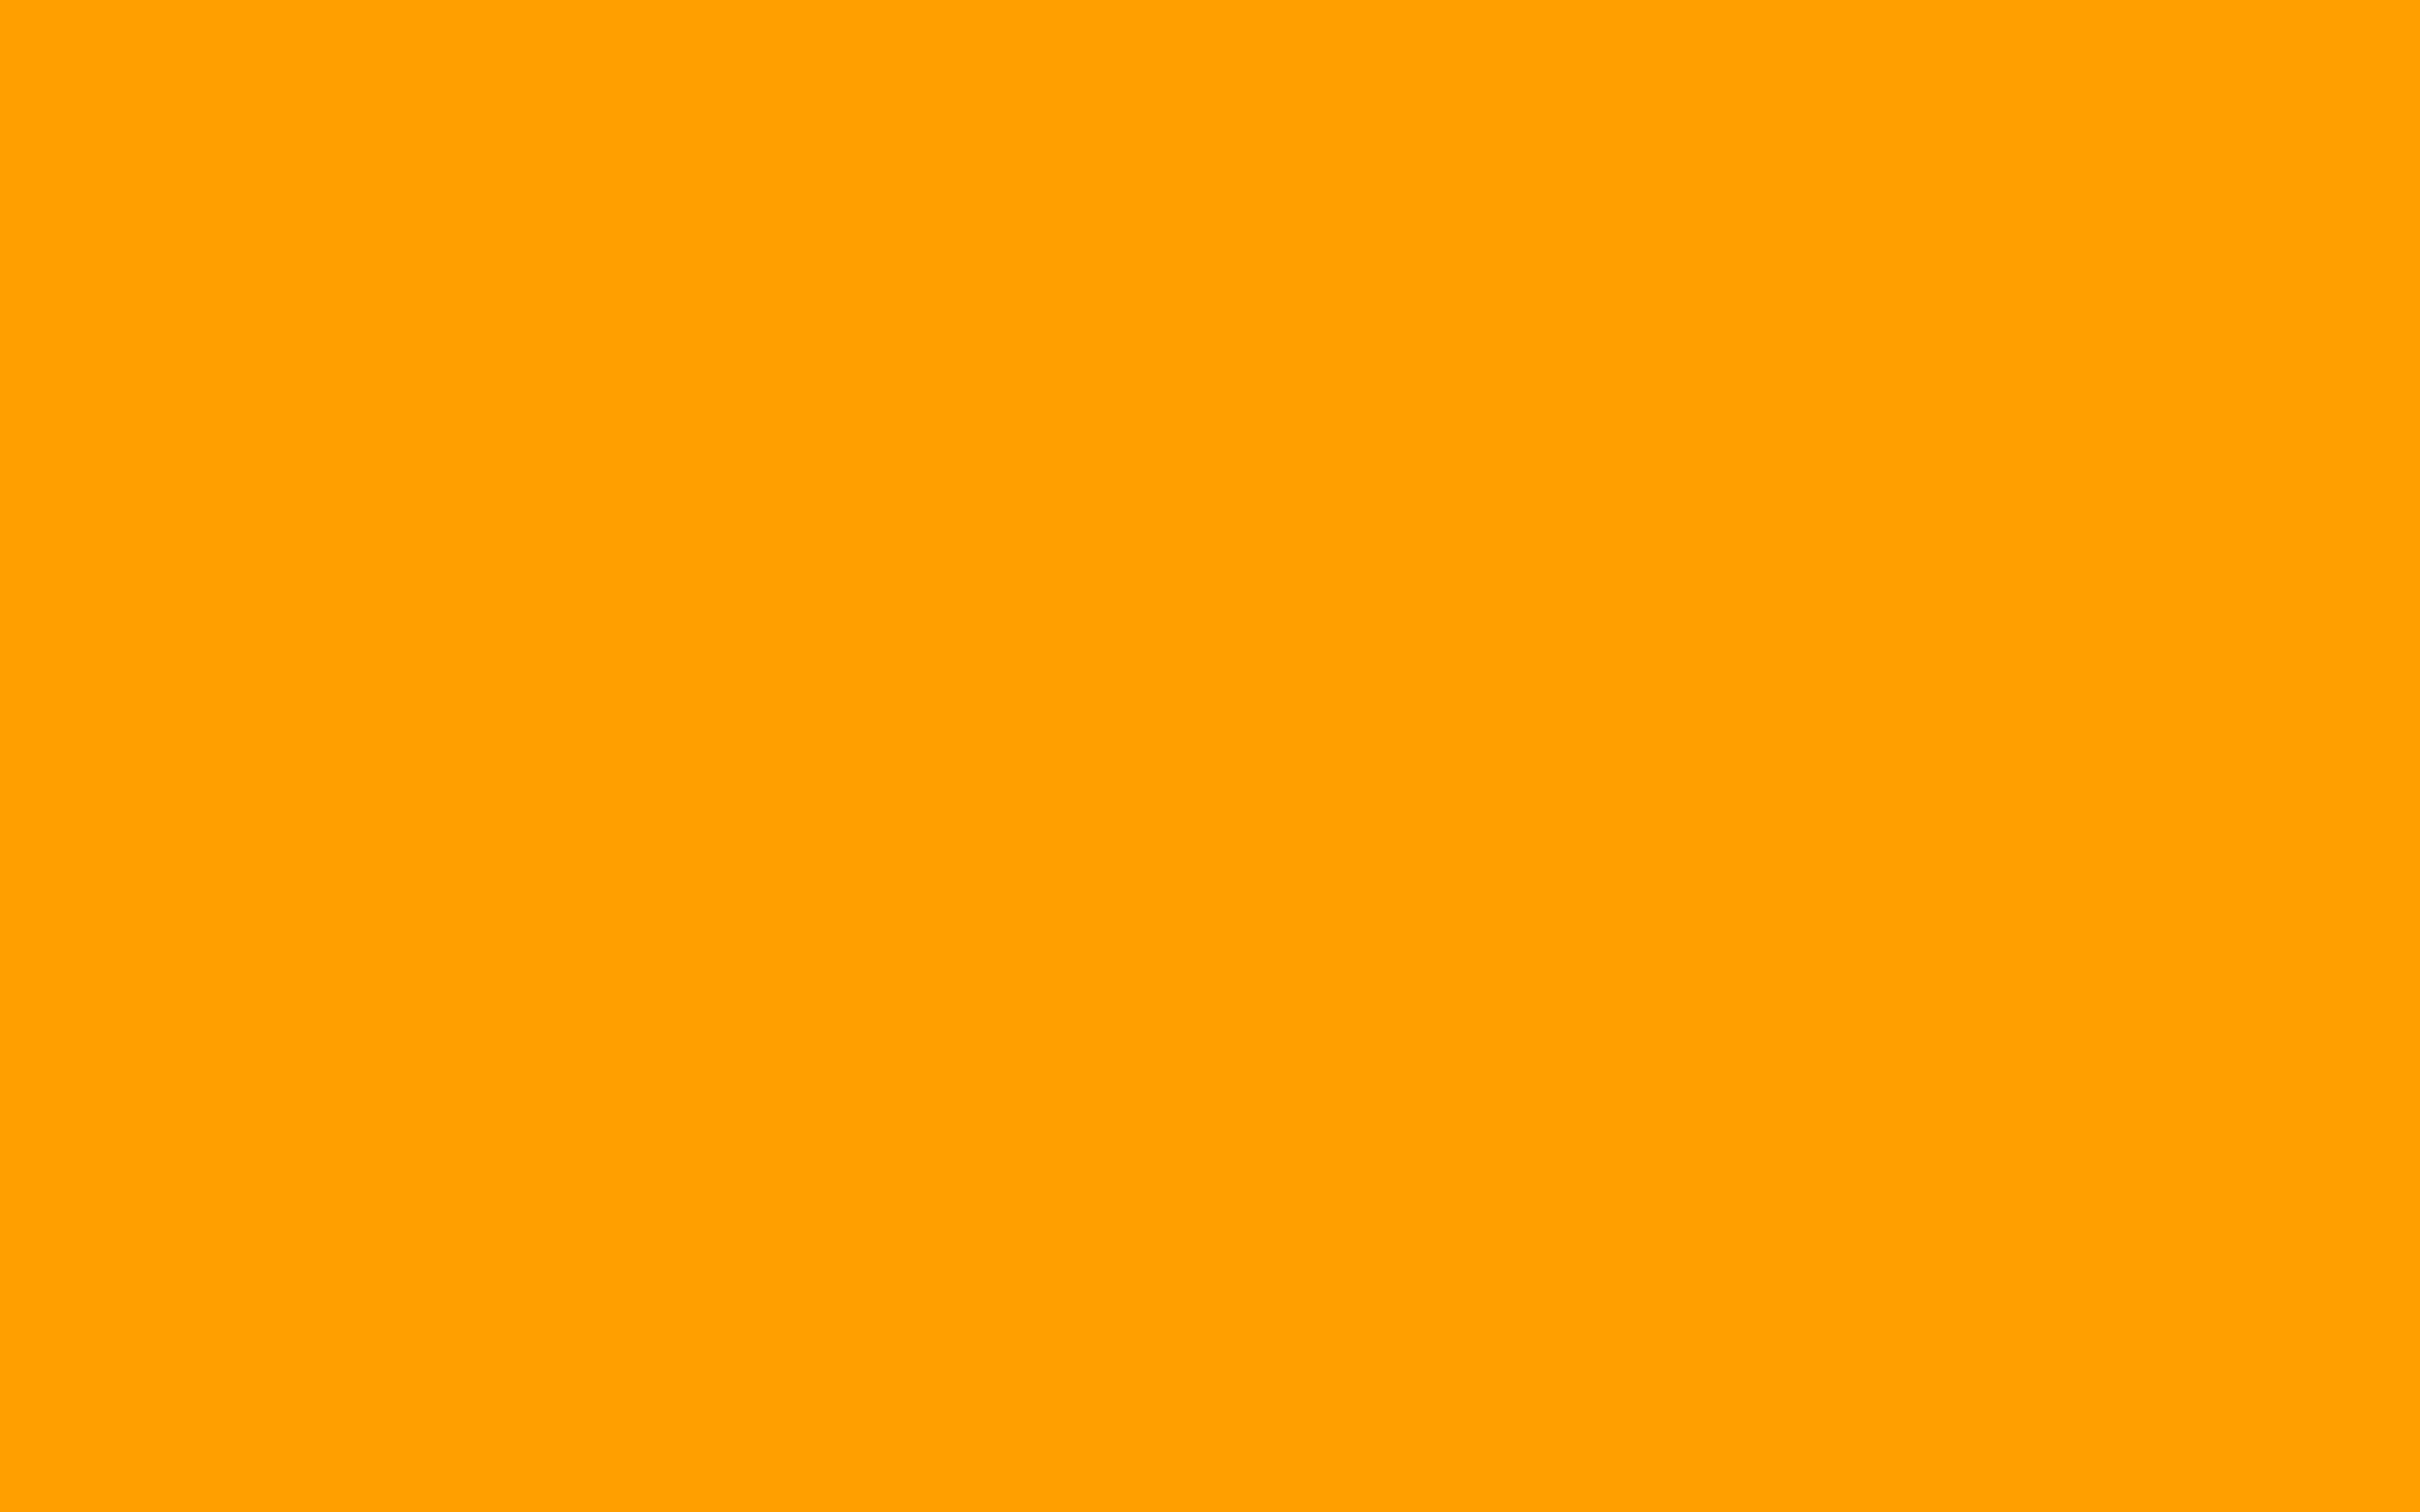 2560x1600 Orange Peel Solid Color Background